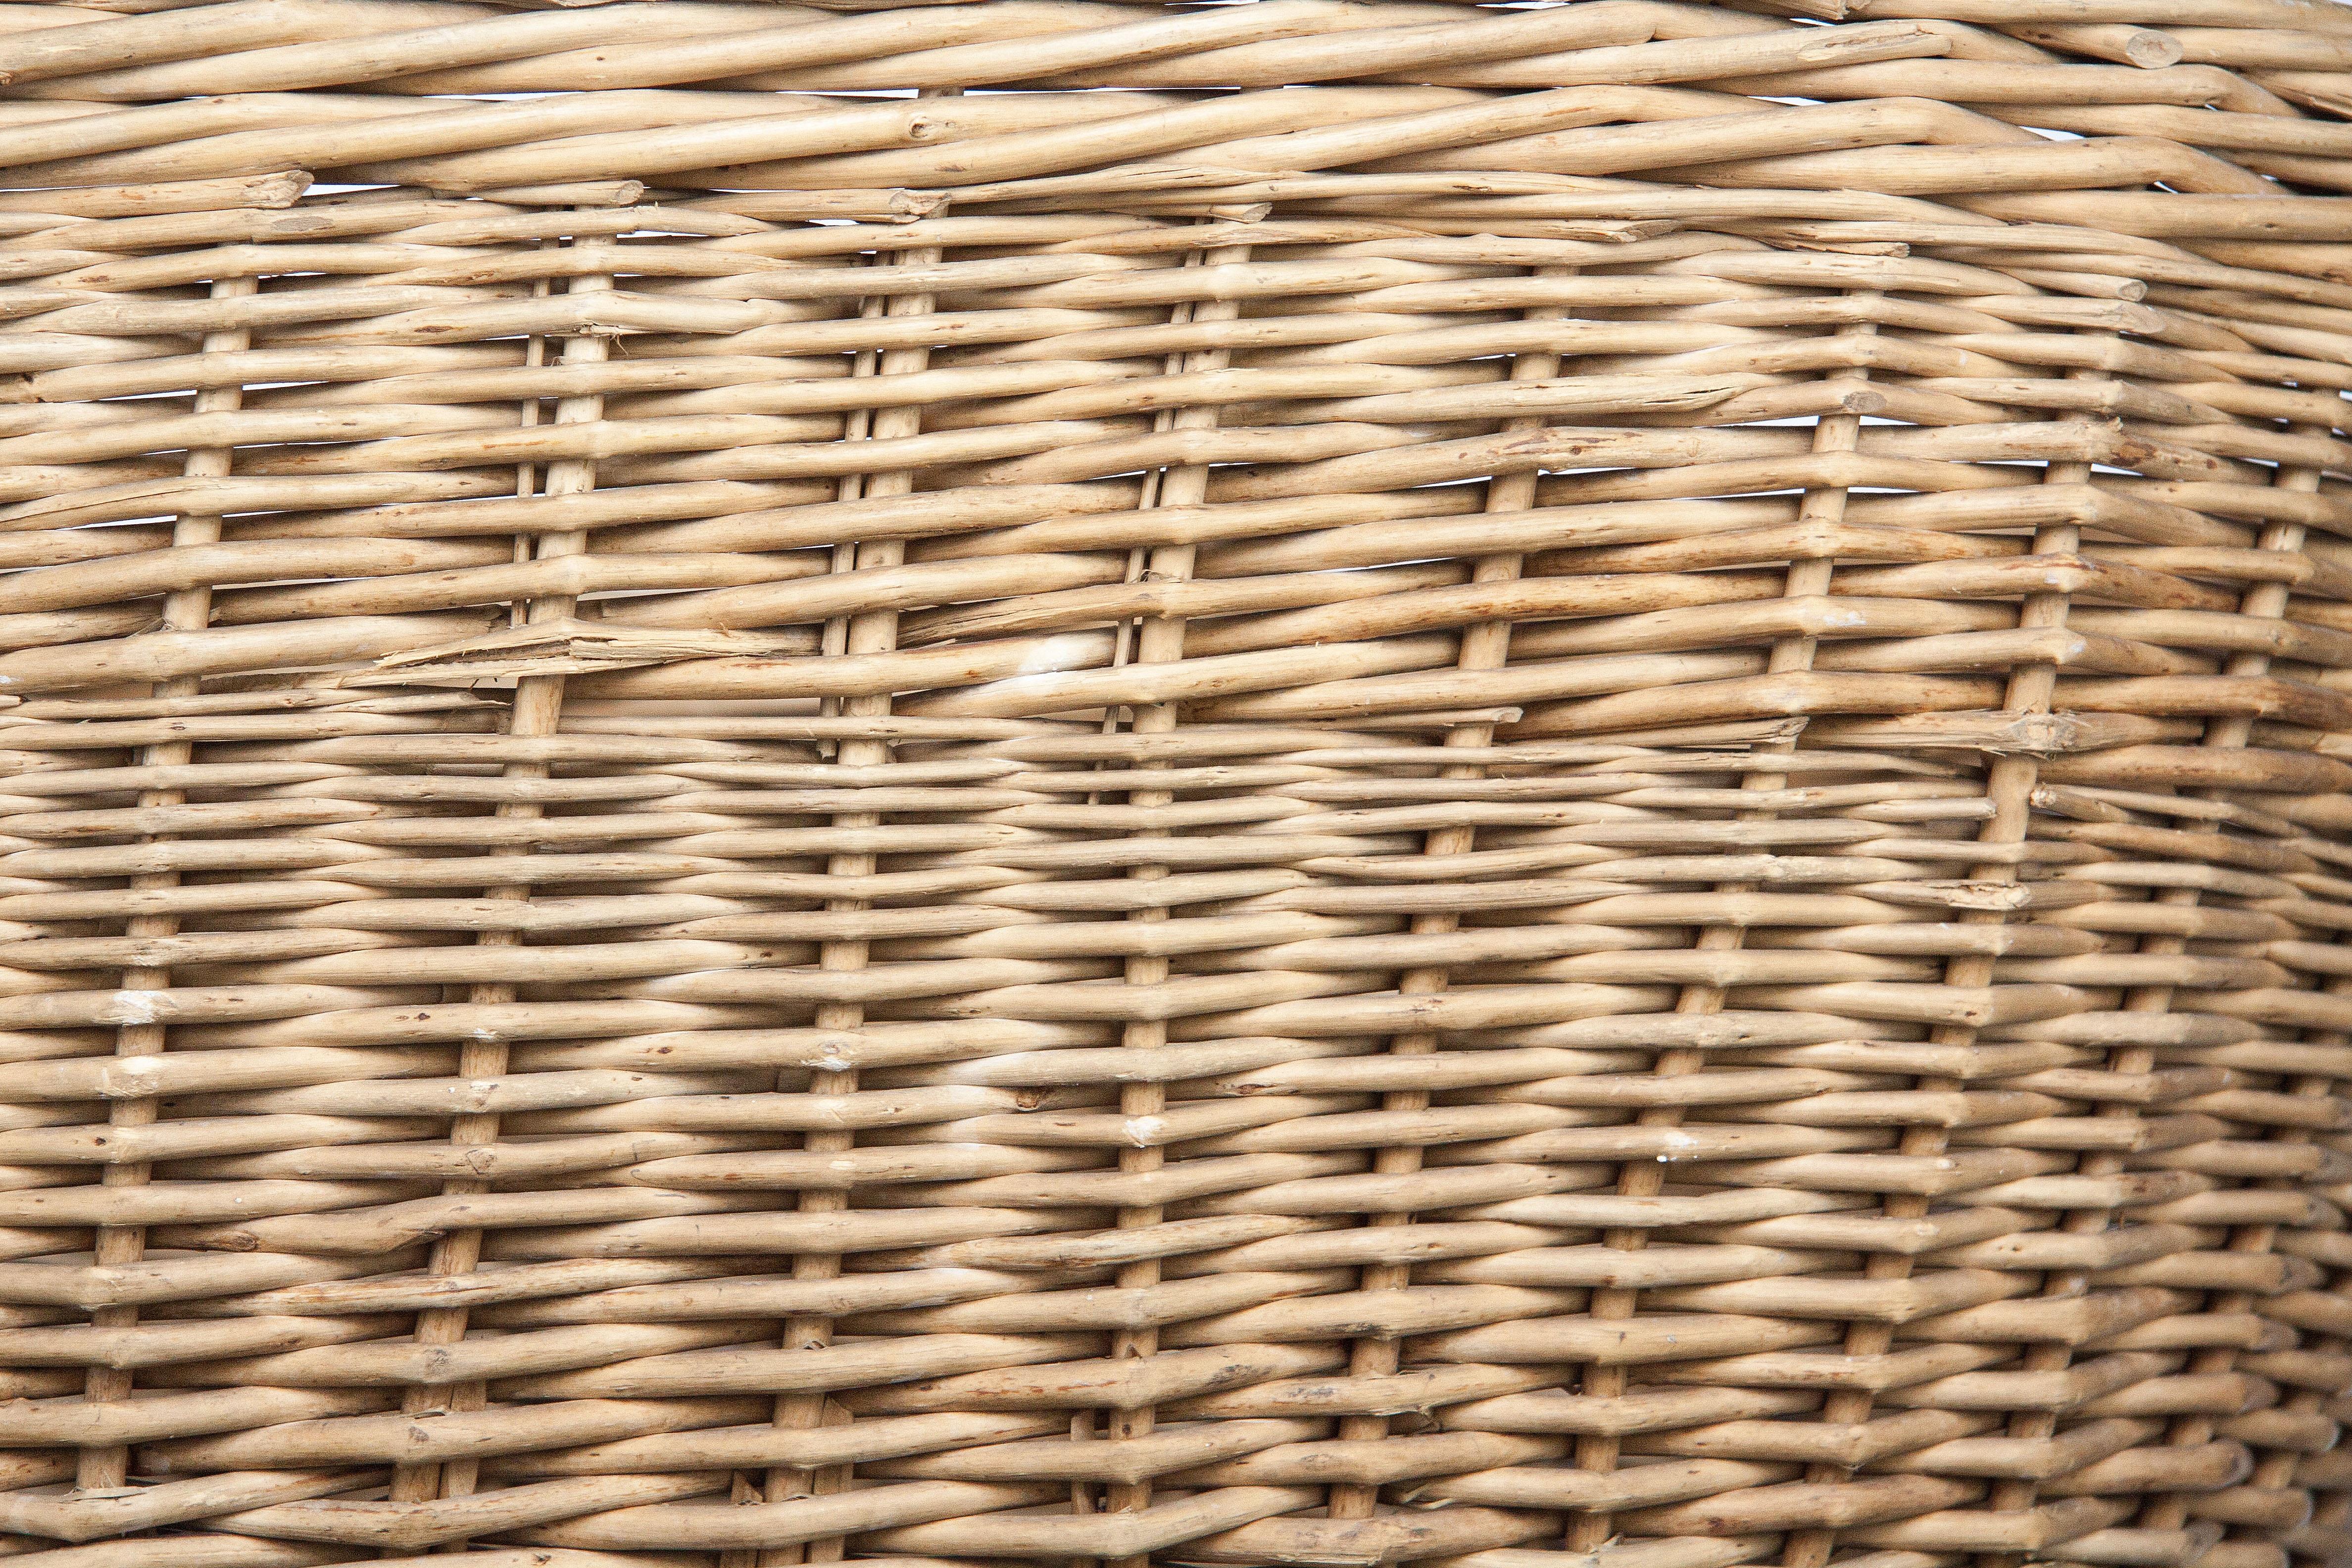 Fotos gratis : estructura, madera, línea, mueble, material, cesta de ...